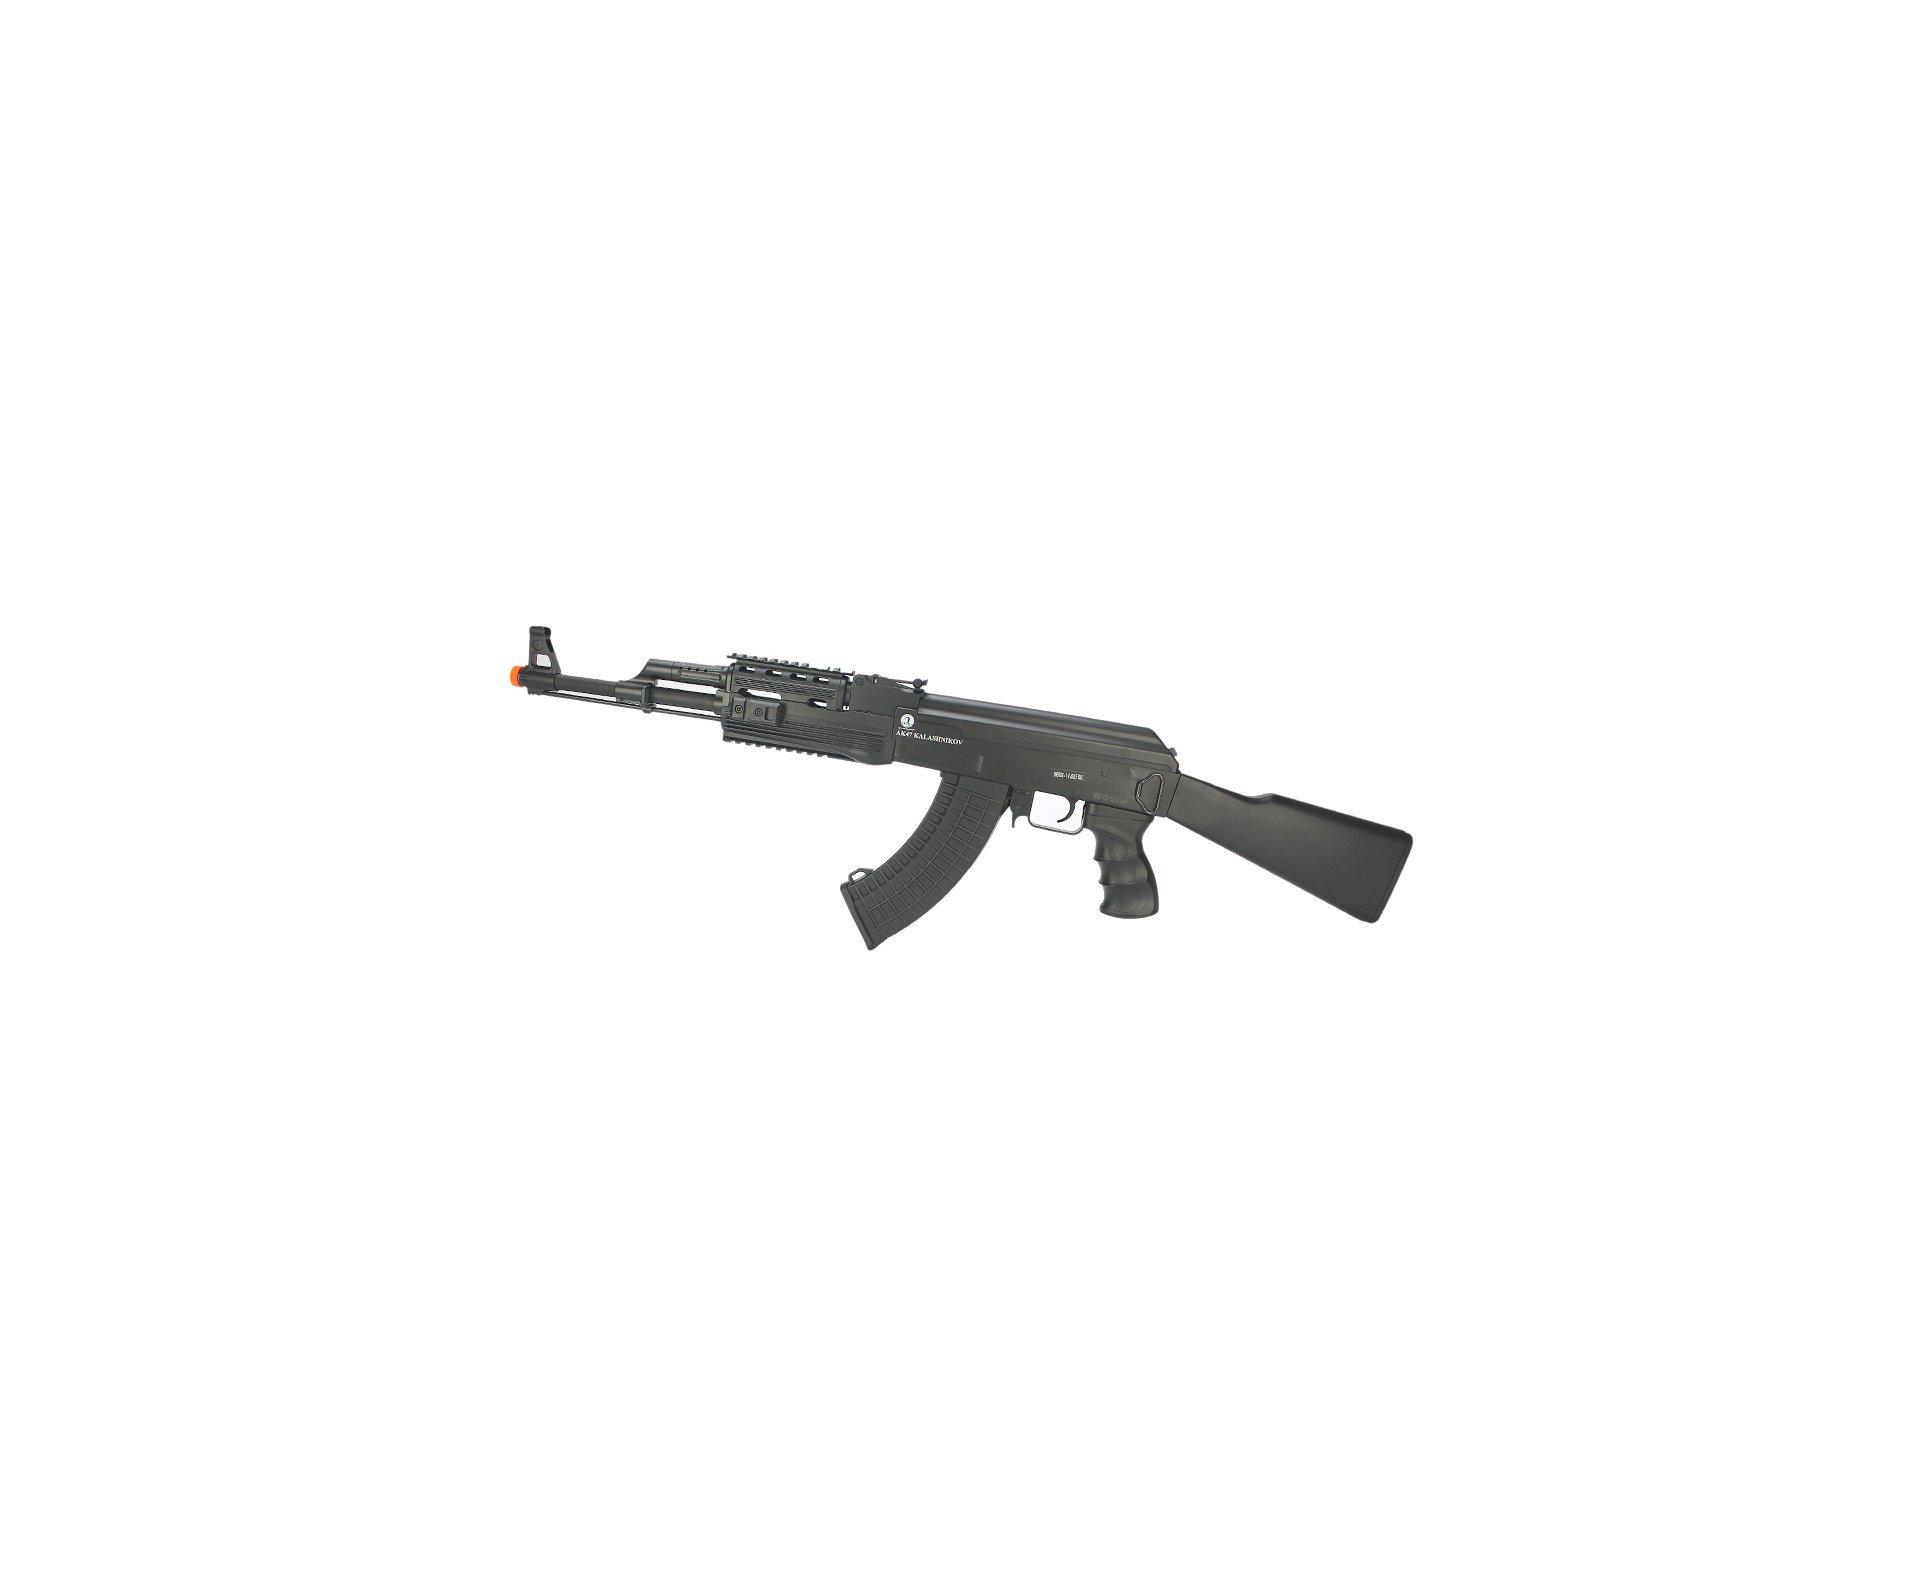 Rifle De Airsoft Ak 47 Tactical Fsv Full - Cal 6,0mm - Cybergun